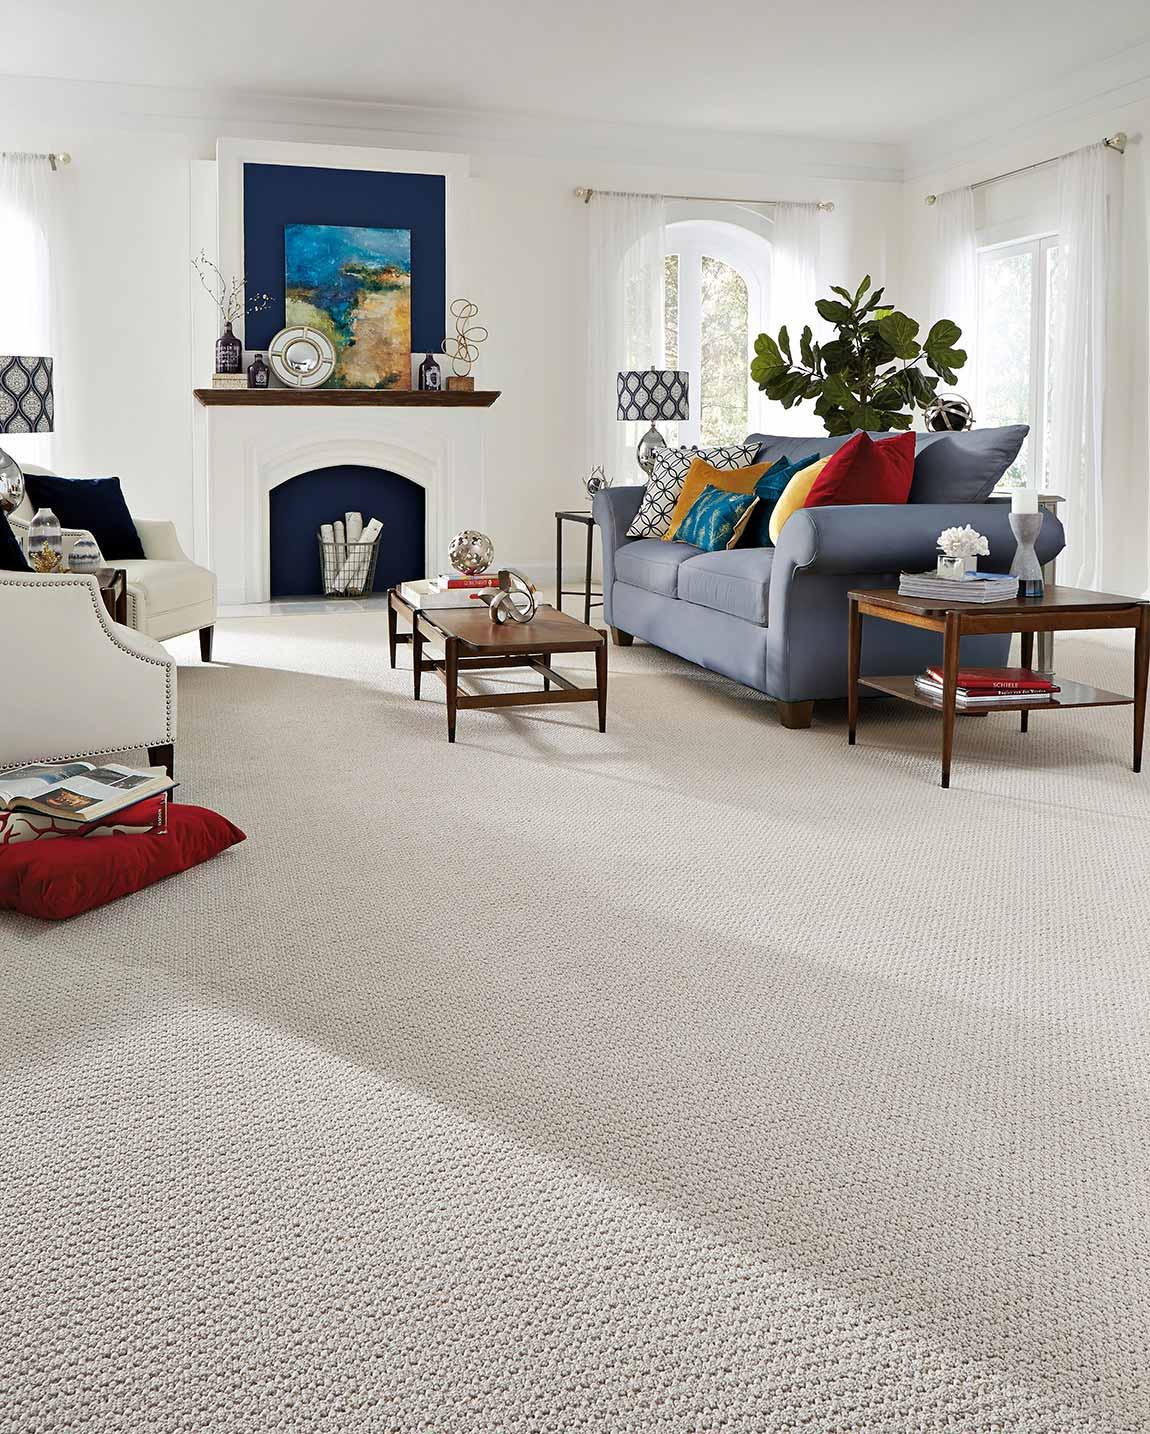 Carpeted Coastal Beach House Living Room Flooring Designs Flooring America